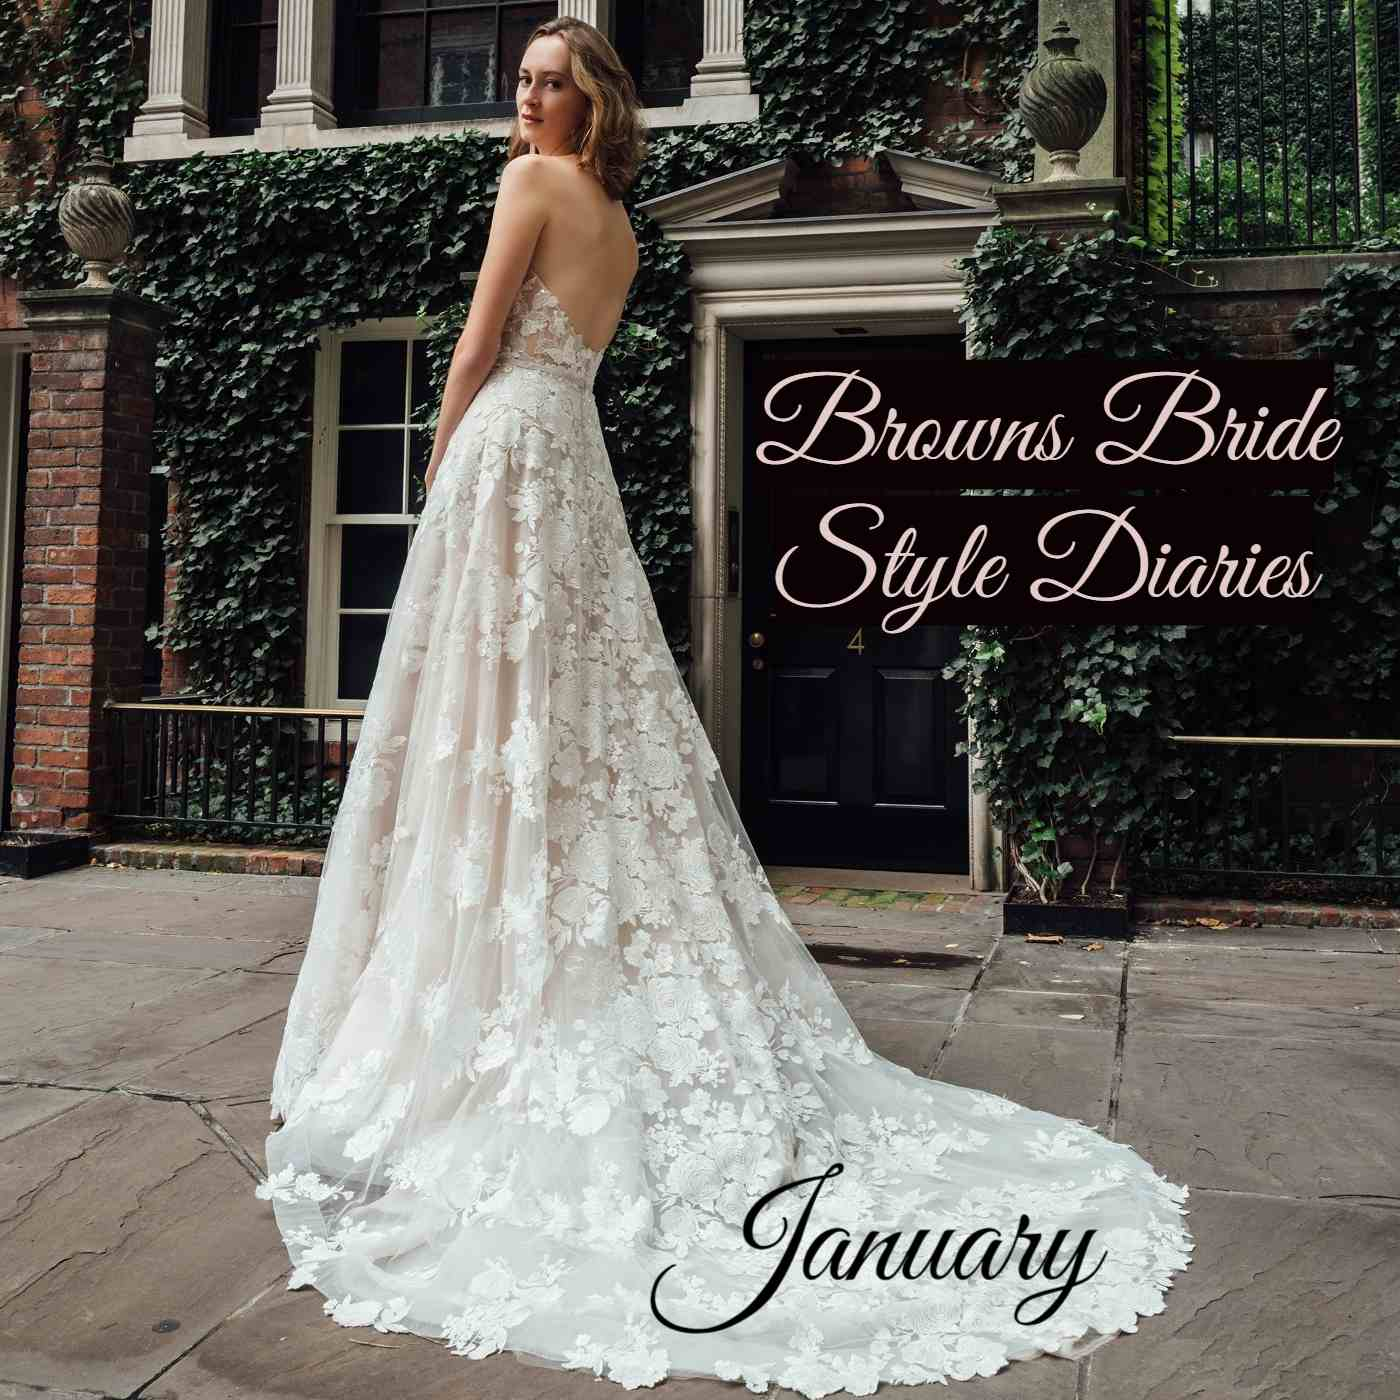 b853b7436bc8 BROWNS BRIDE STYLE DIARIES - JANUARY 2019 - Browns Bride